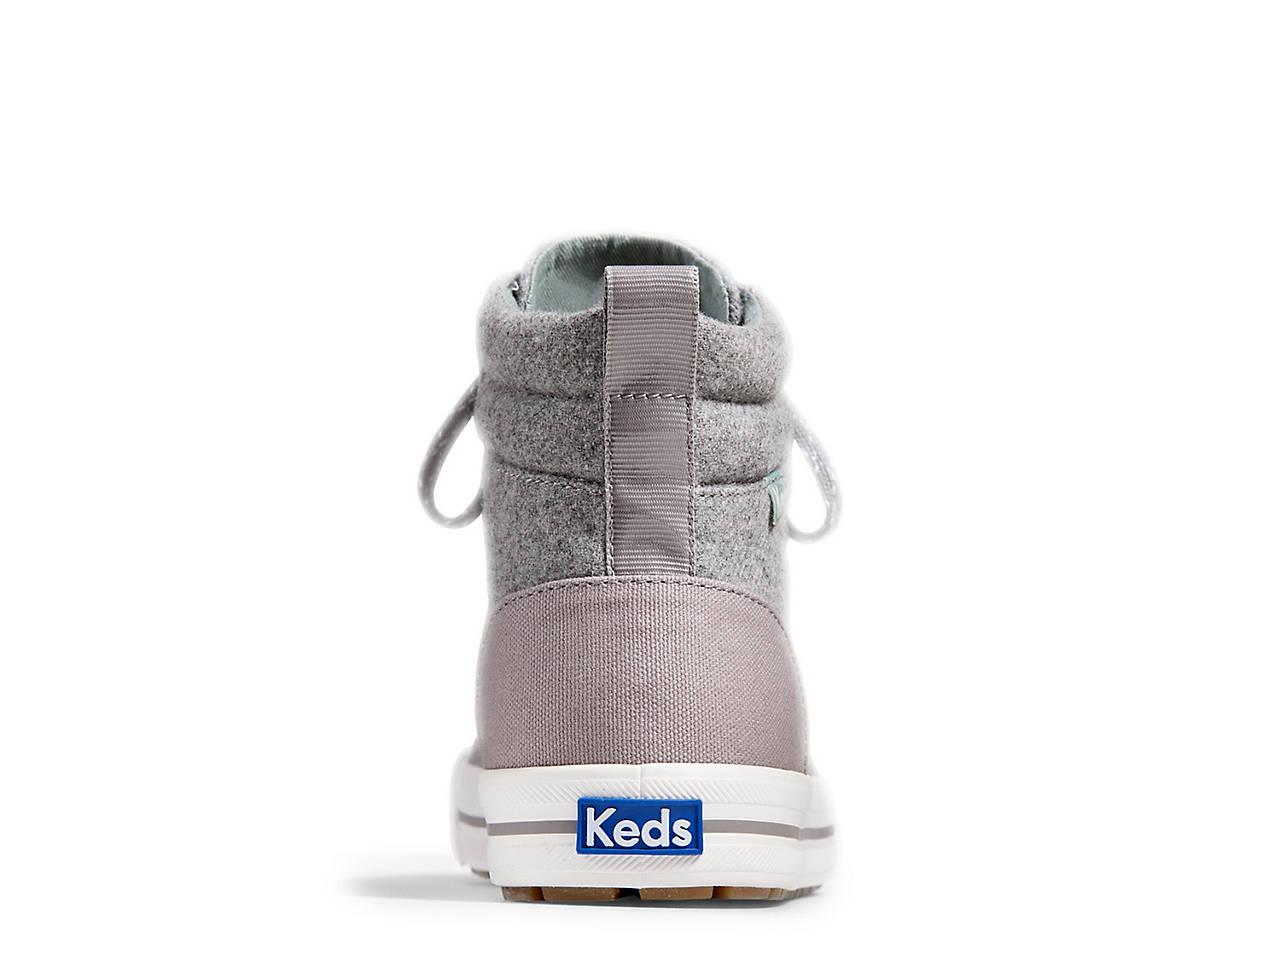 cc4b63a844da3 Keds Topkick High-Top Sneaker - Women s Women s Shoes